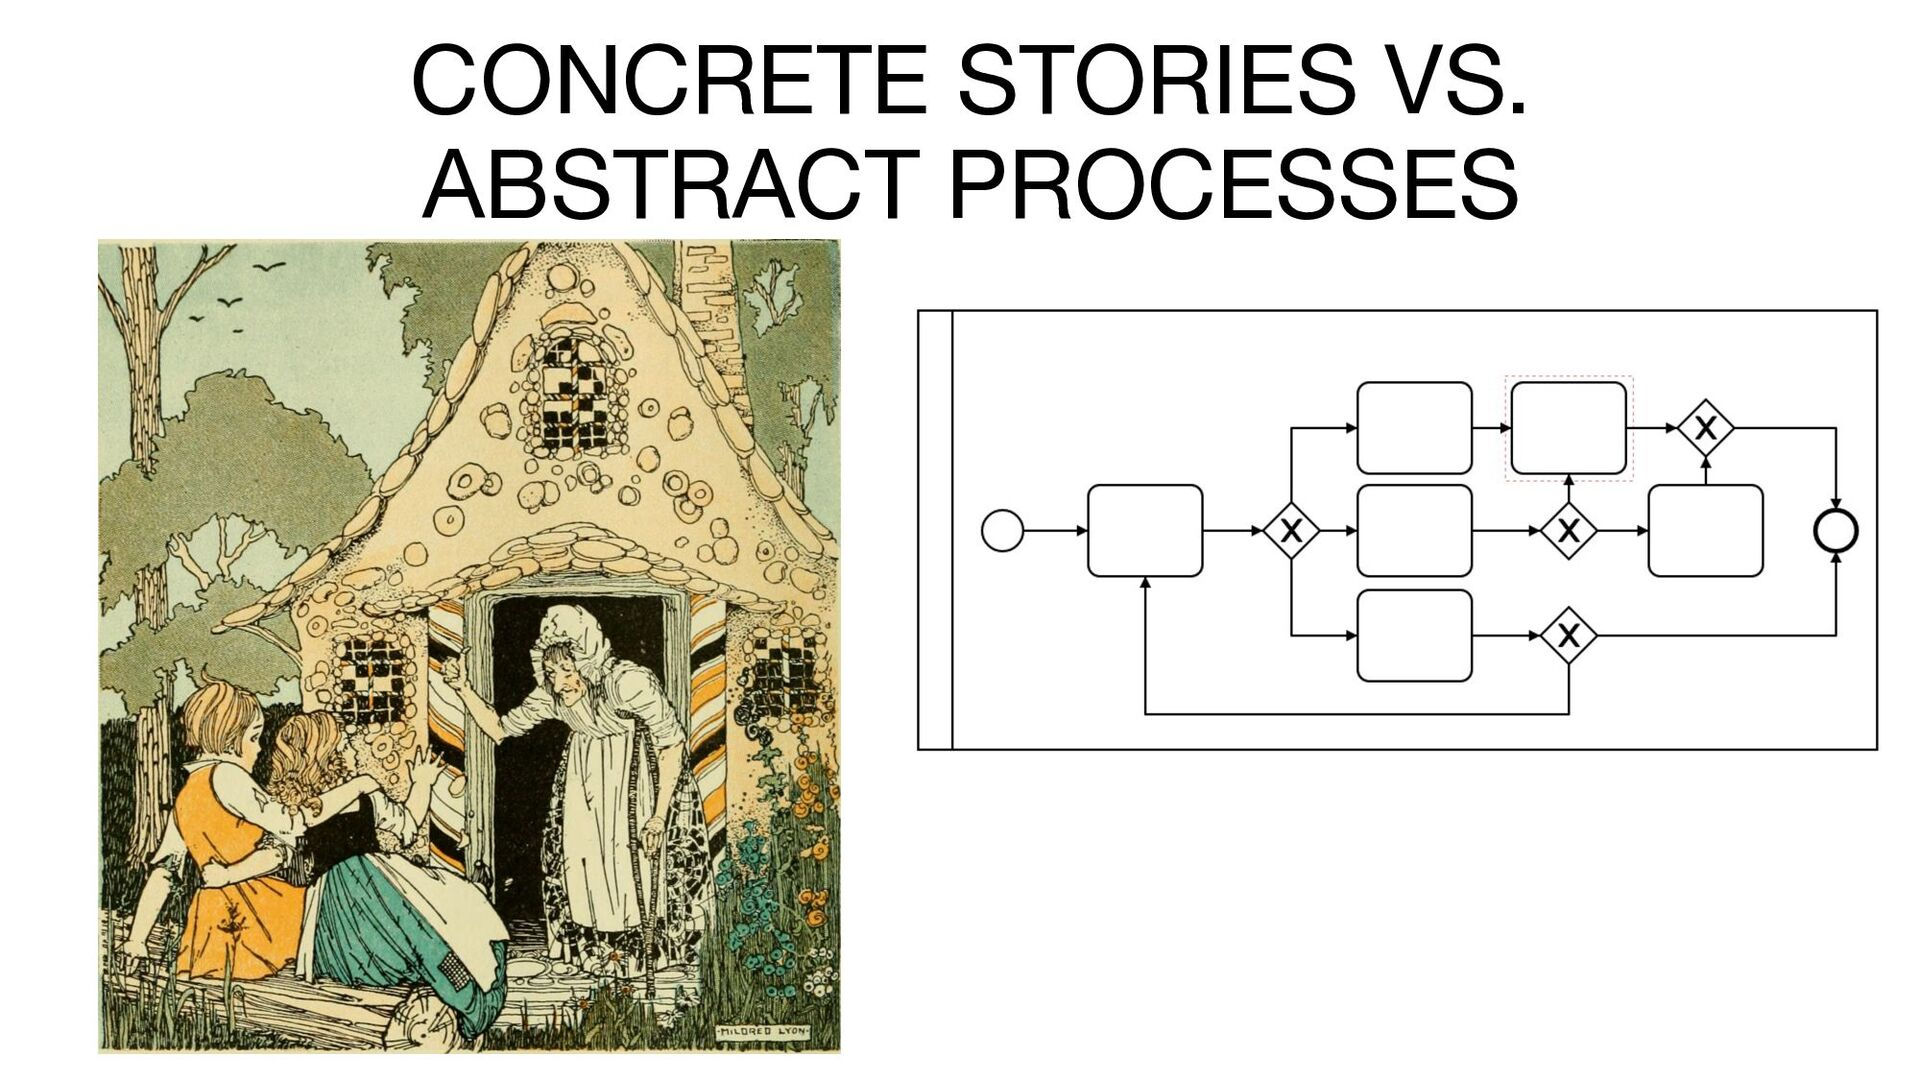 @hschwentner Risk manager contract votes